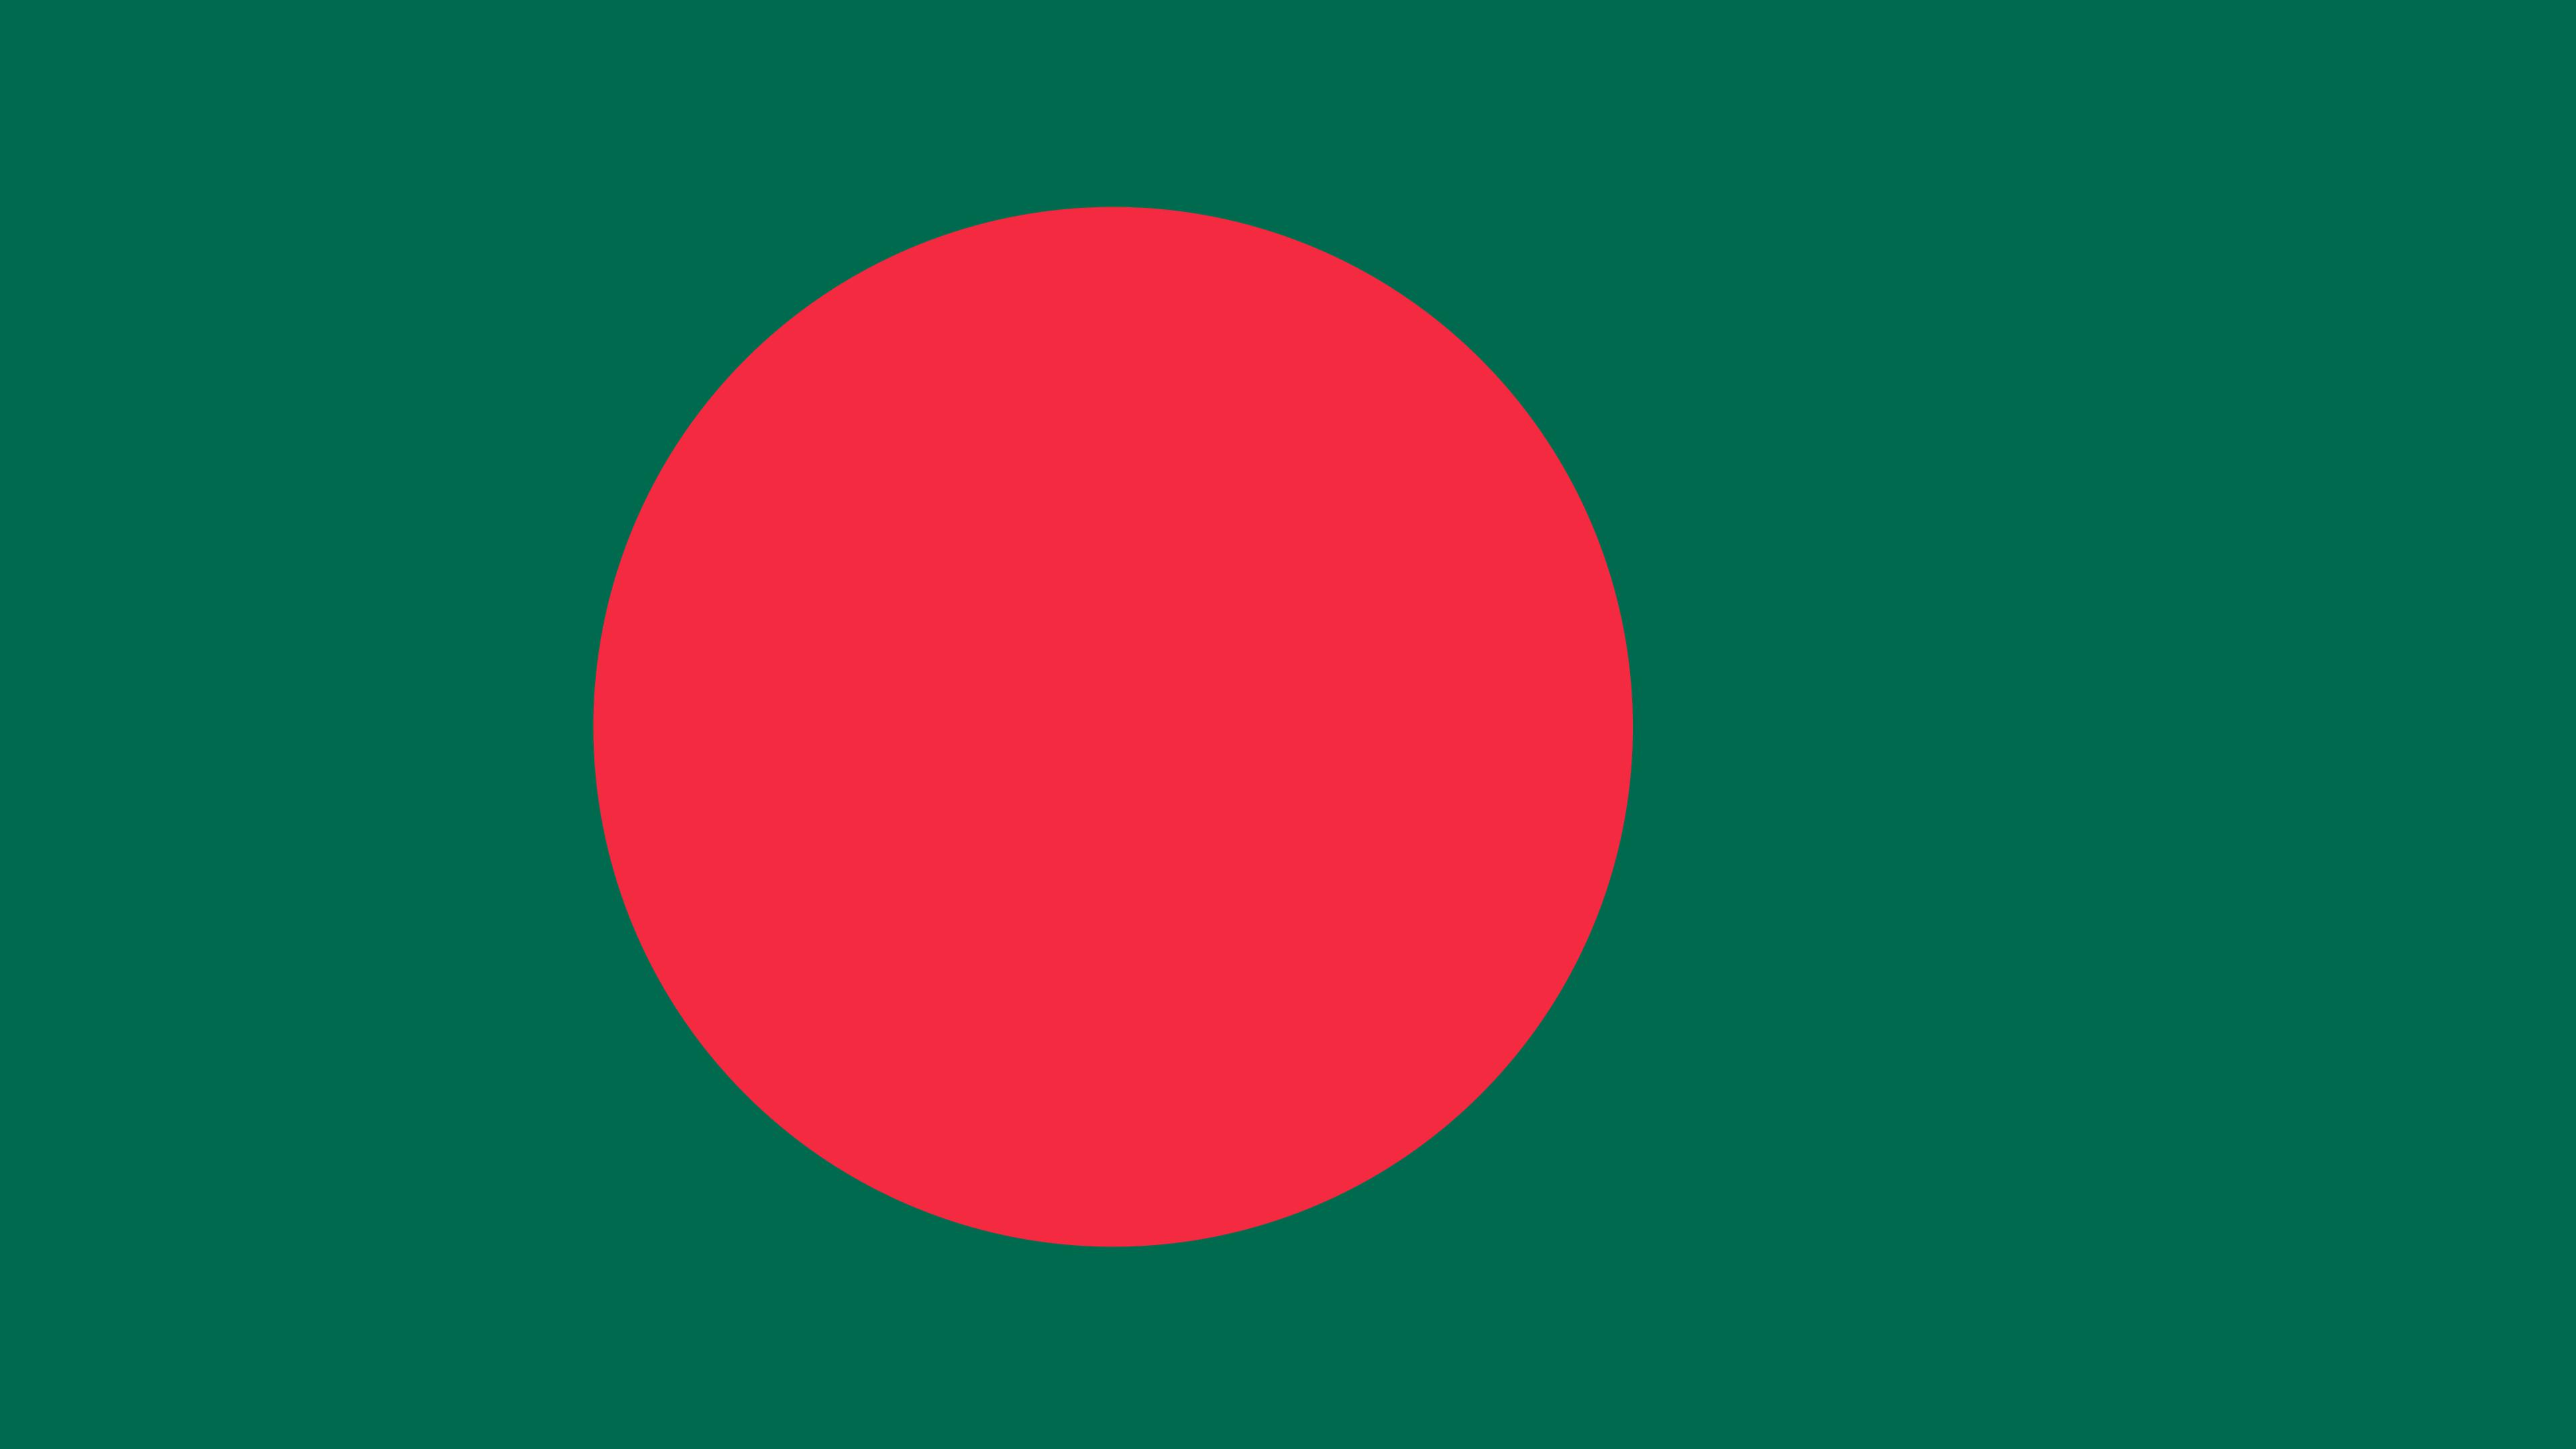 bangladesh flag uhd 4k wallpaper